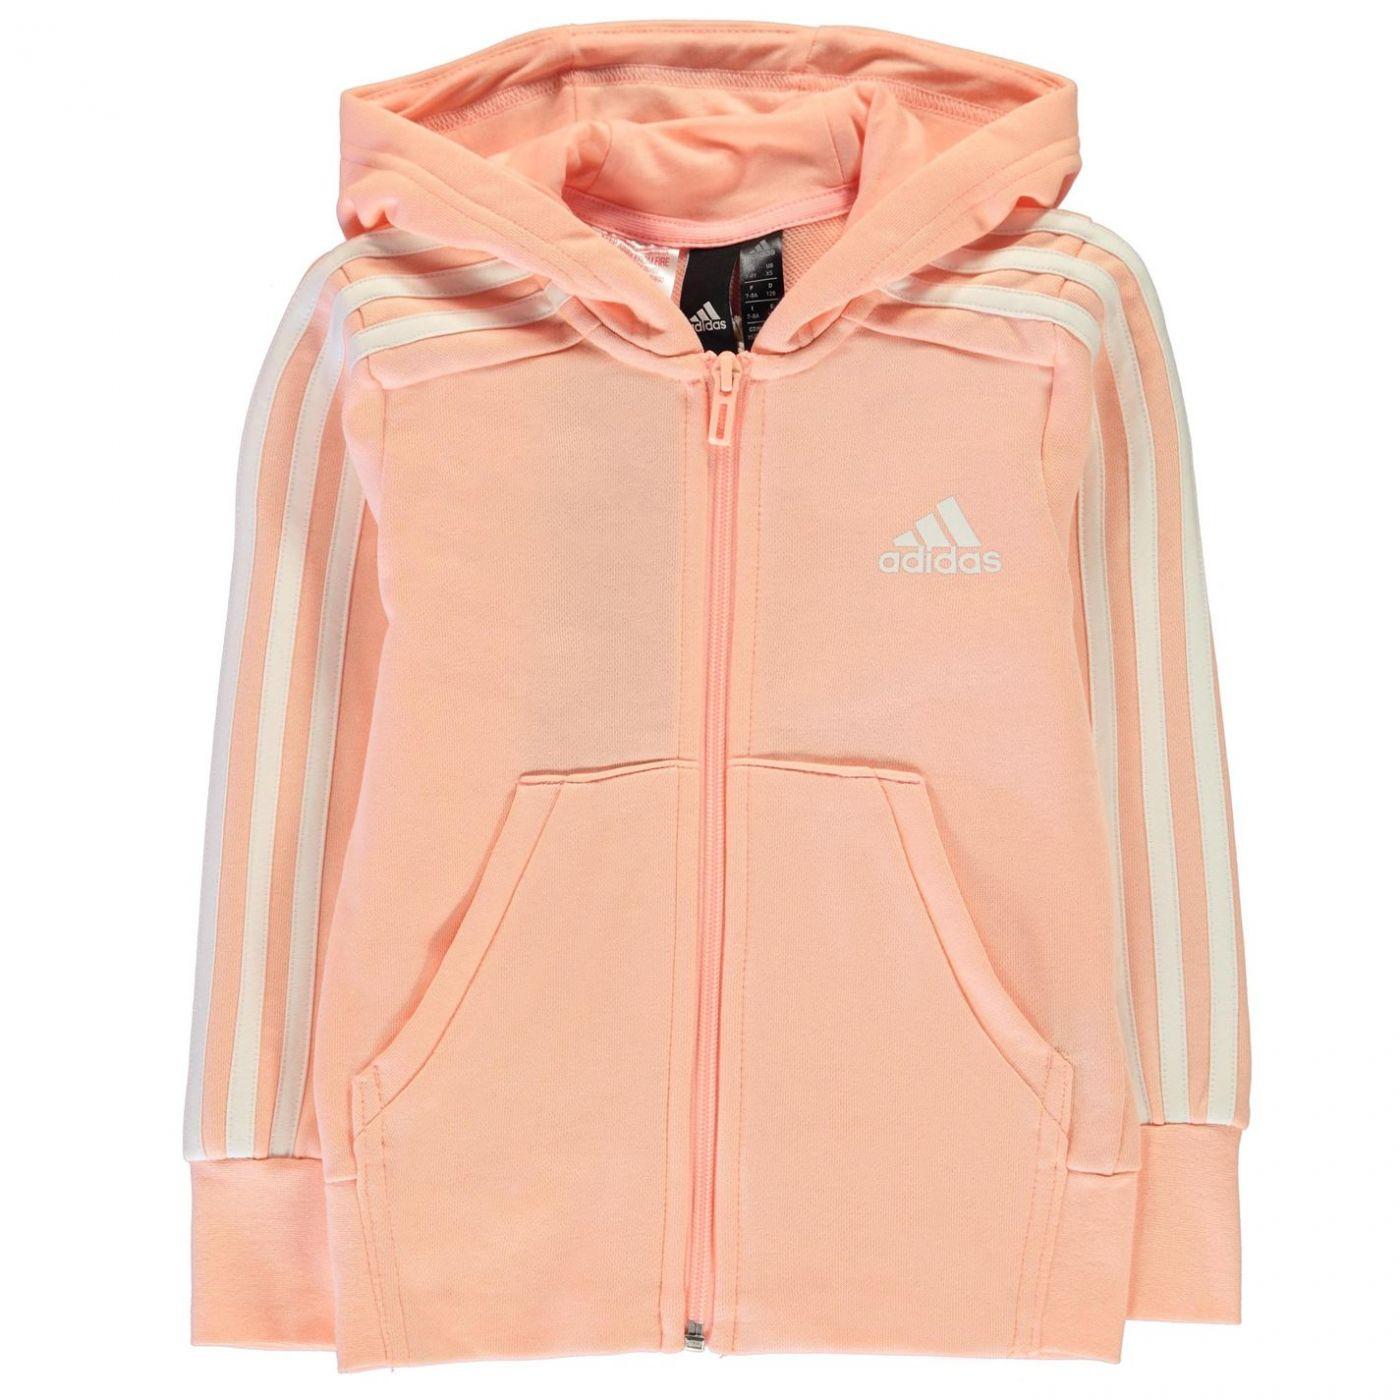 Adidas 3 Stripe Zip Hoody Junior Girls